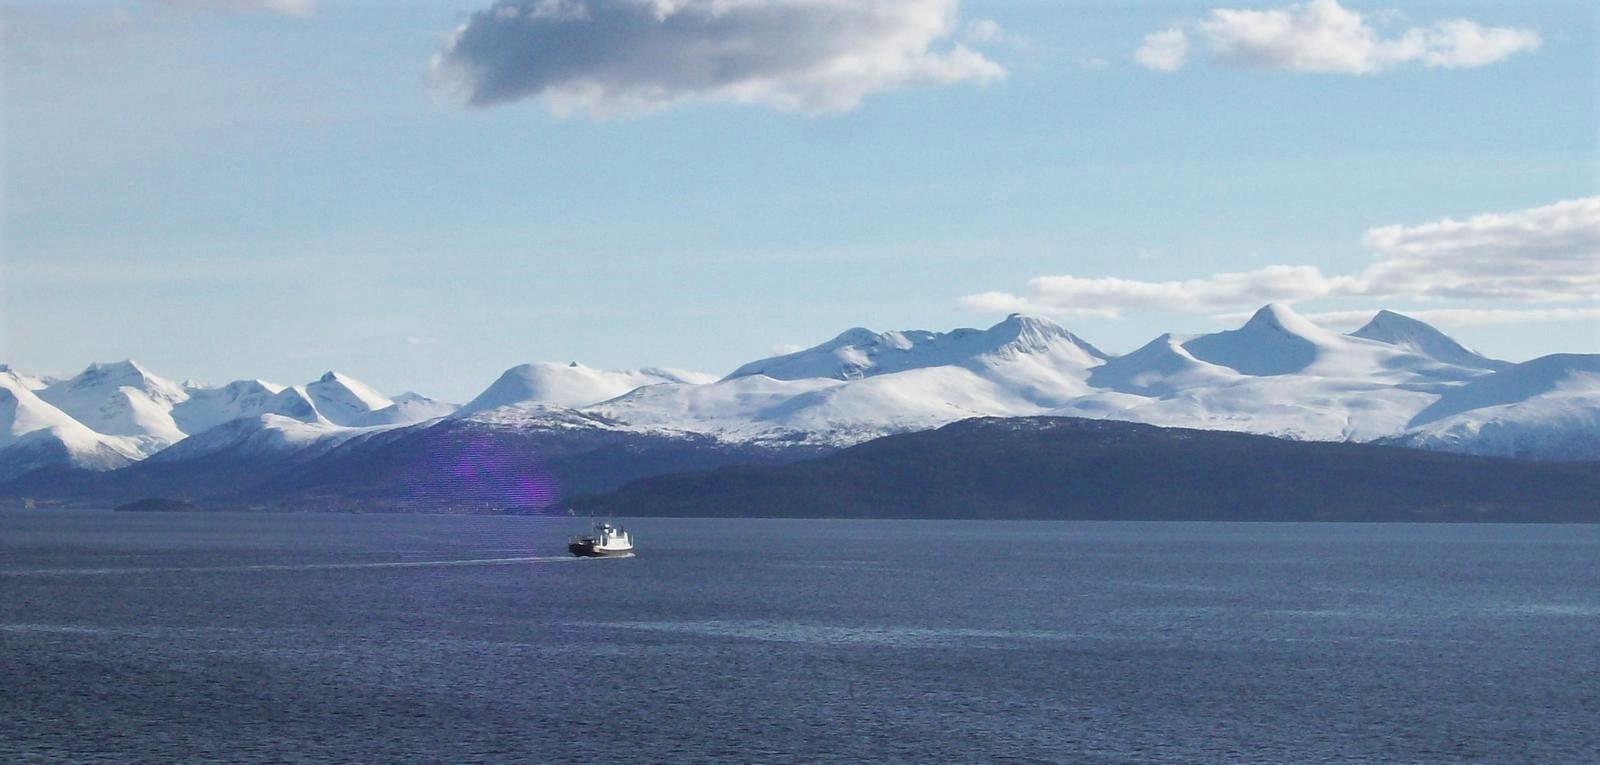 Hurtigruten - MS Trollfjord - Blick auf die Romsdalsalpen